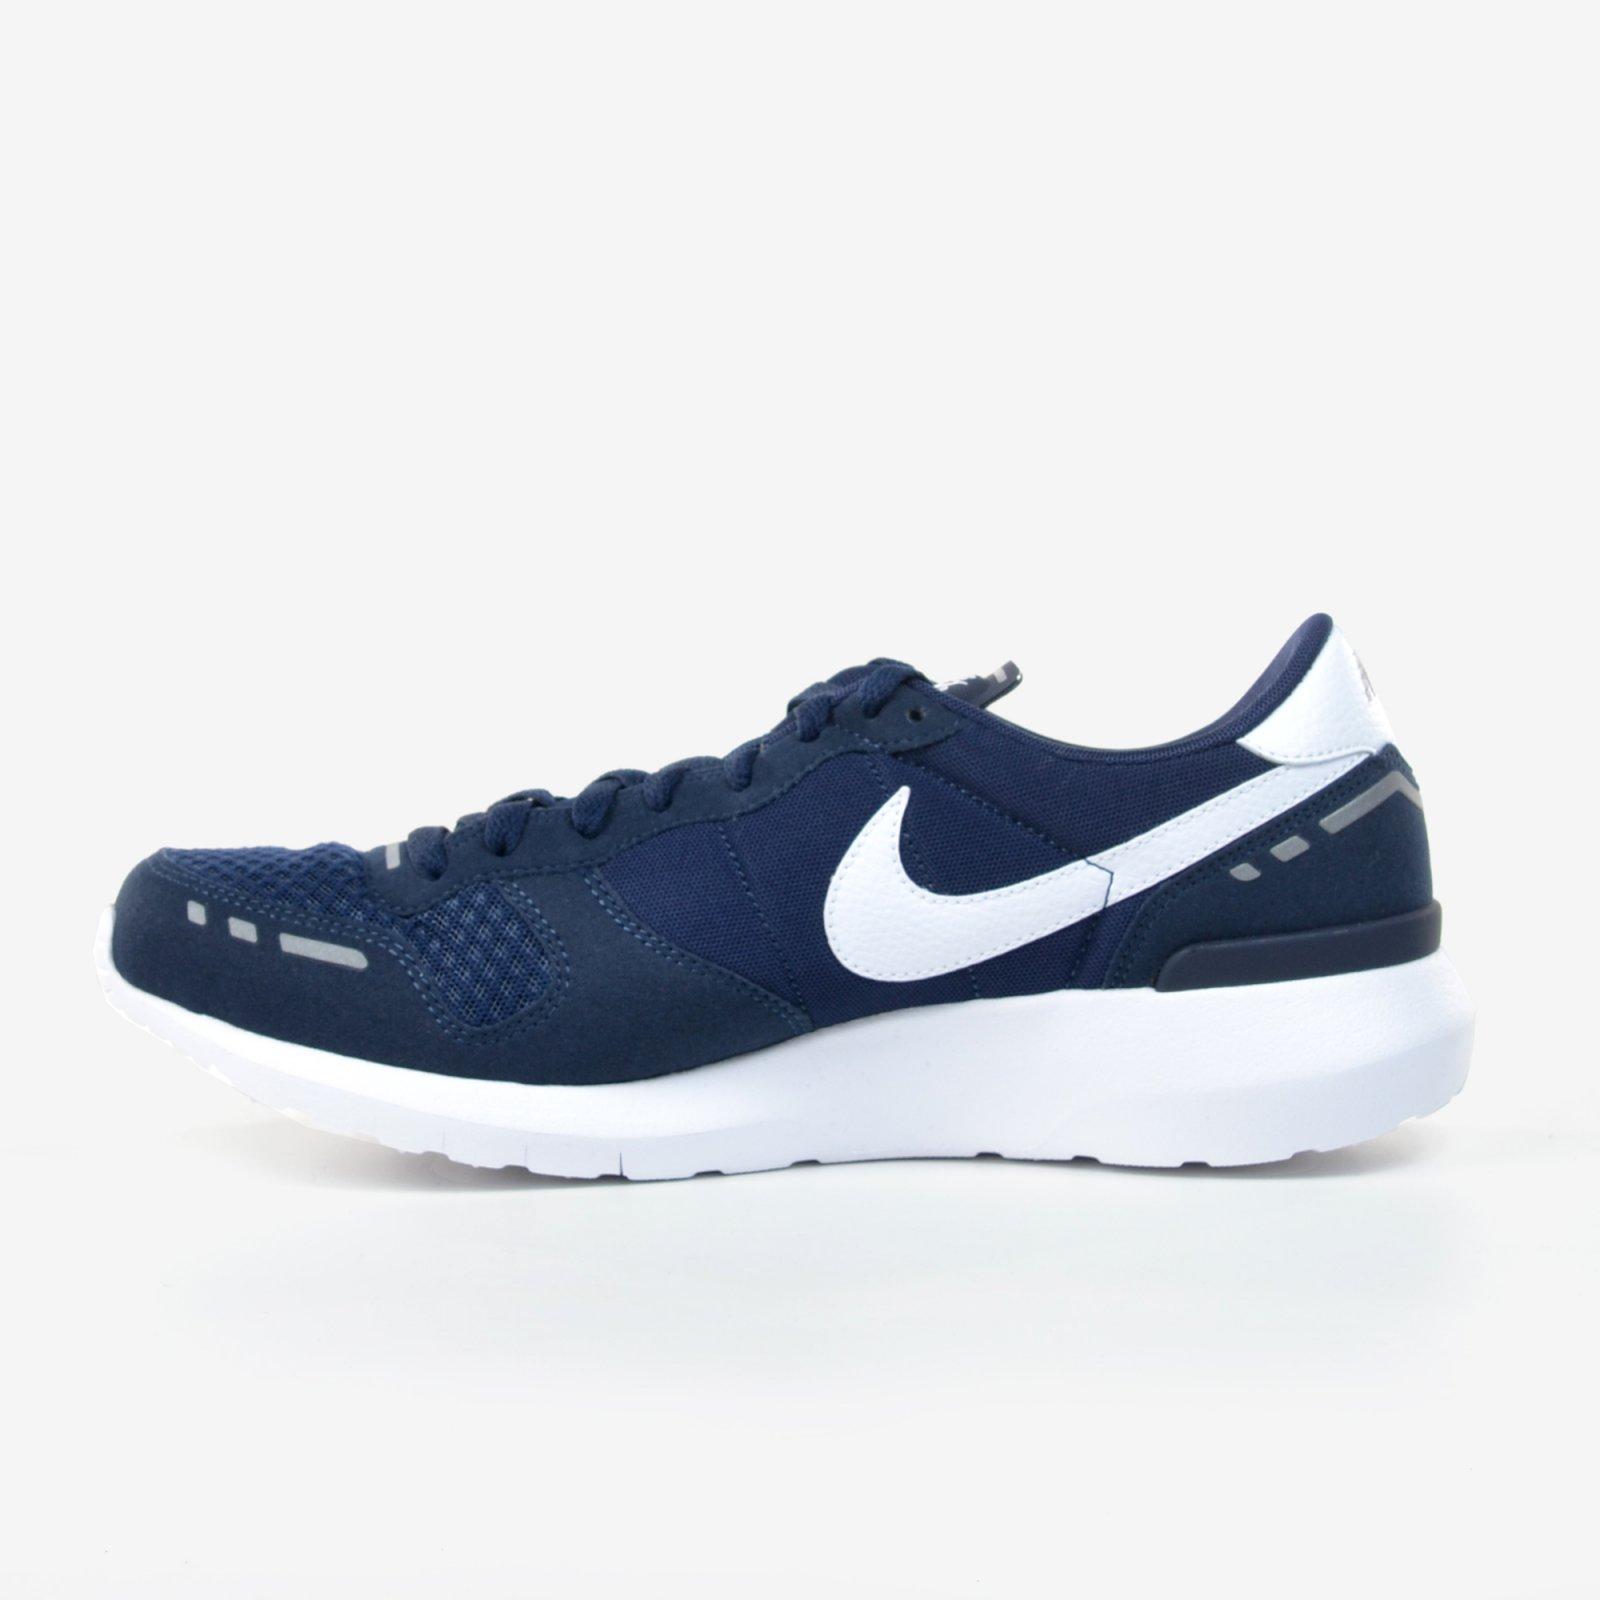 20865cd485b7 Nike Air Vrtx  17 Vortex Midnight Navy White 2017 Obsidian Men s DS  876135-400